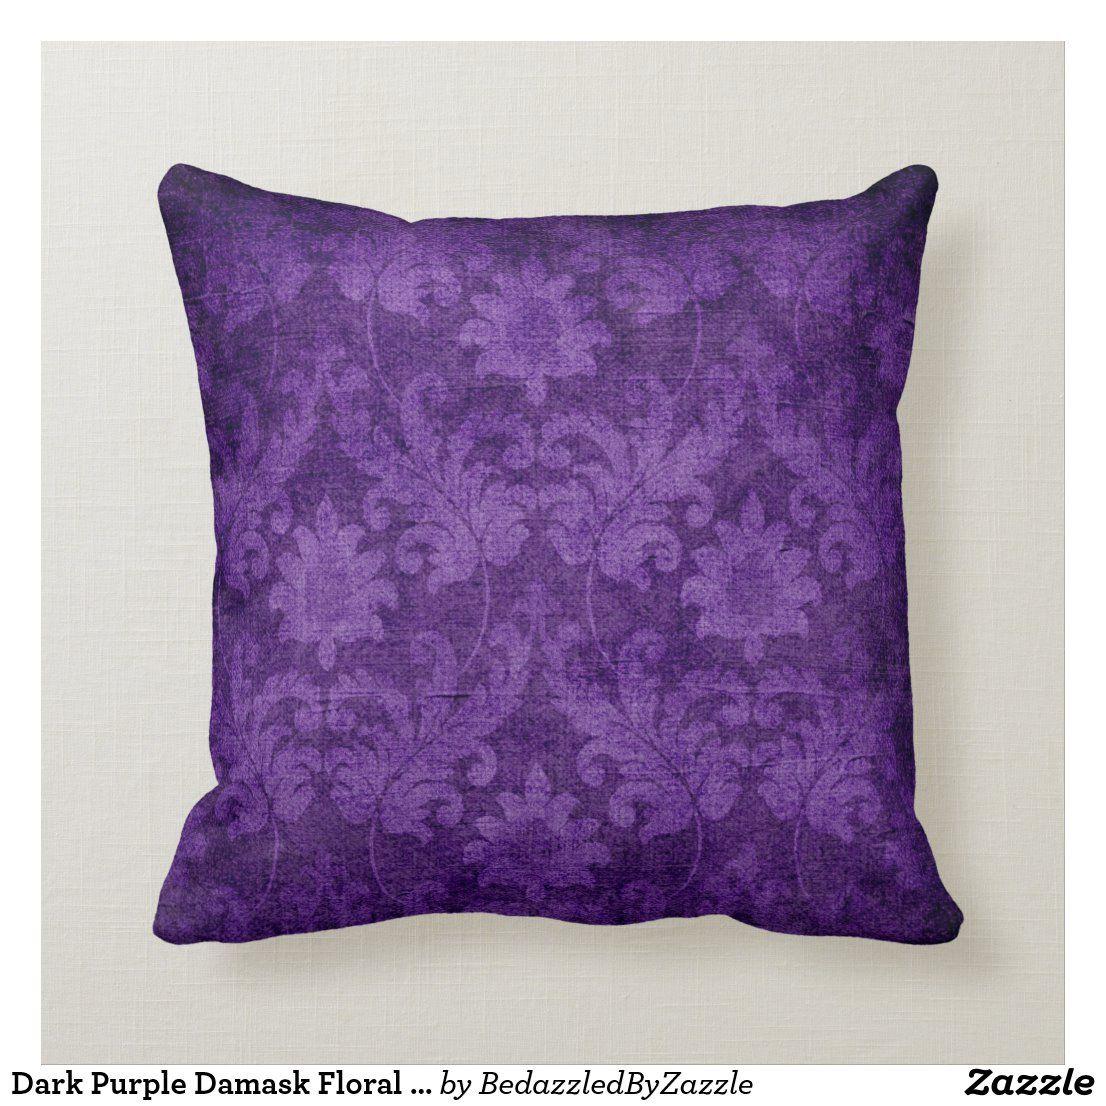 Dark Purple Damask Floral Decorative Pattern Throw Pillow Zazzle